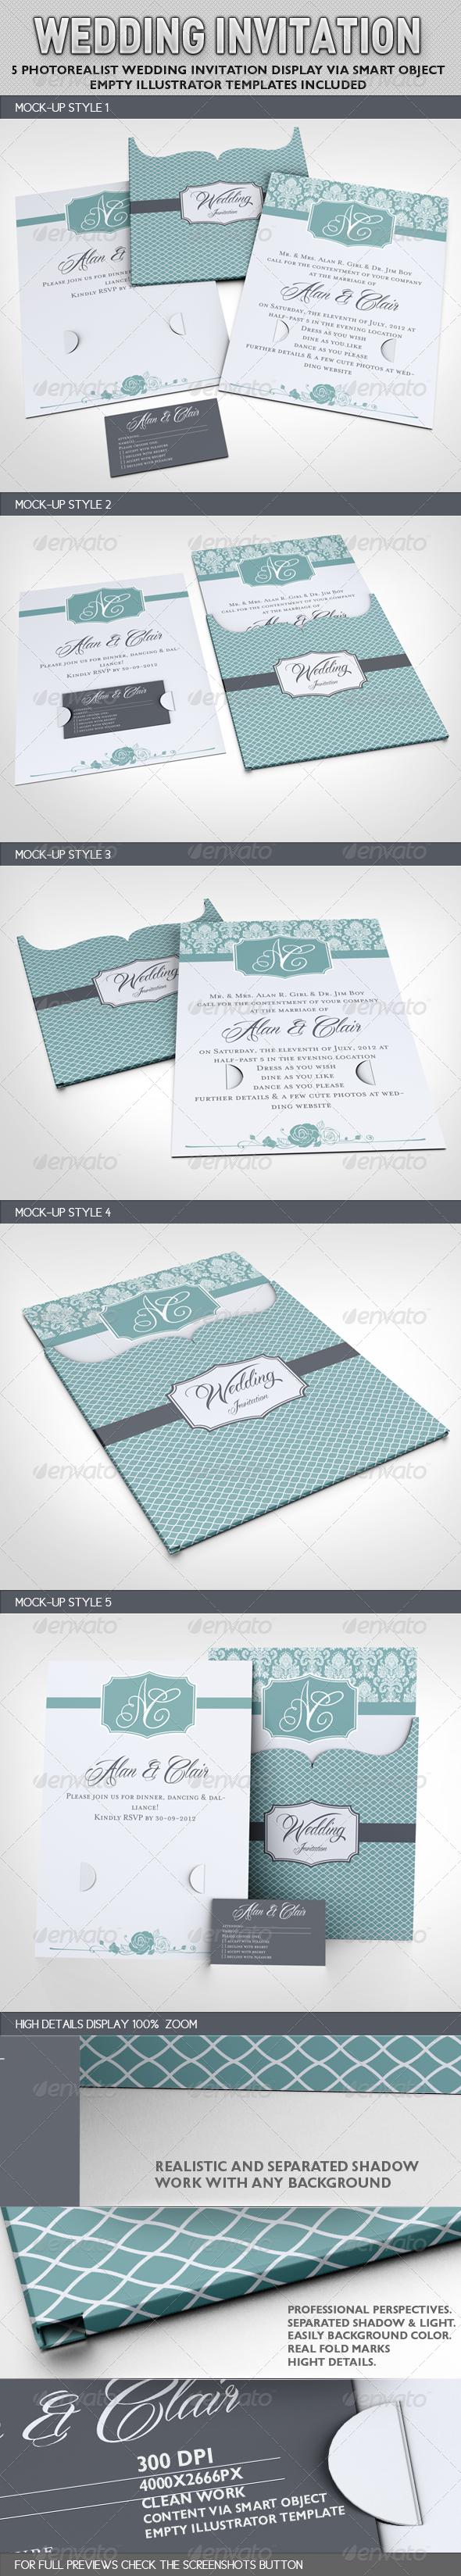 GraphicRiver Wedding Invitation Jacket Mock-up 2997519